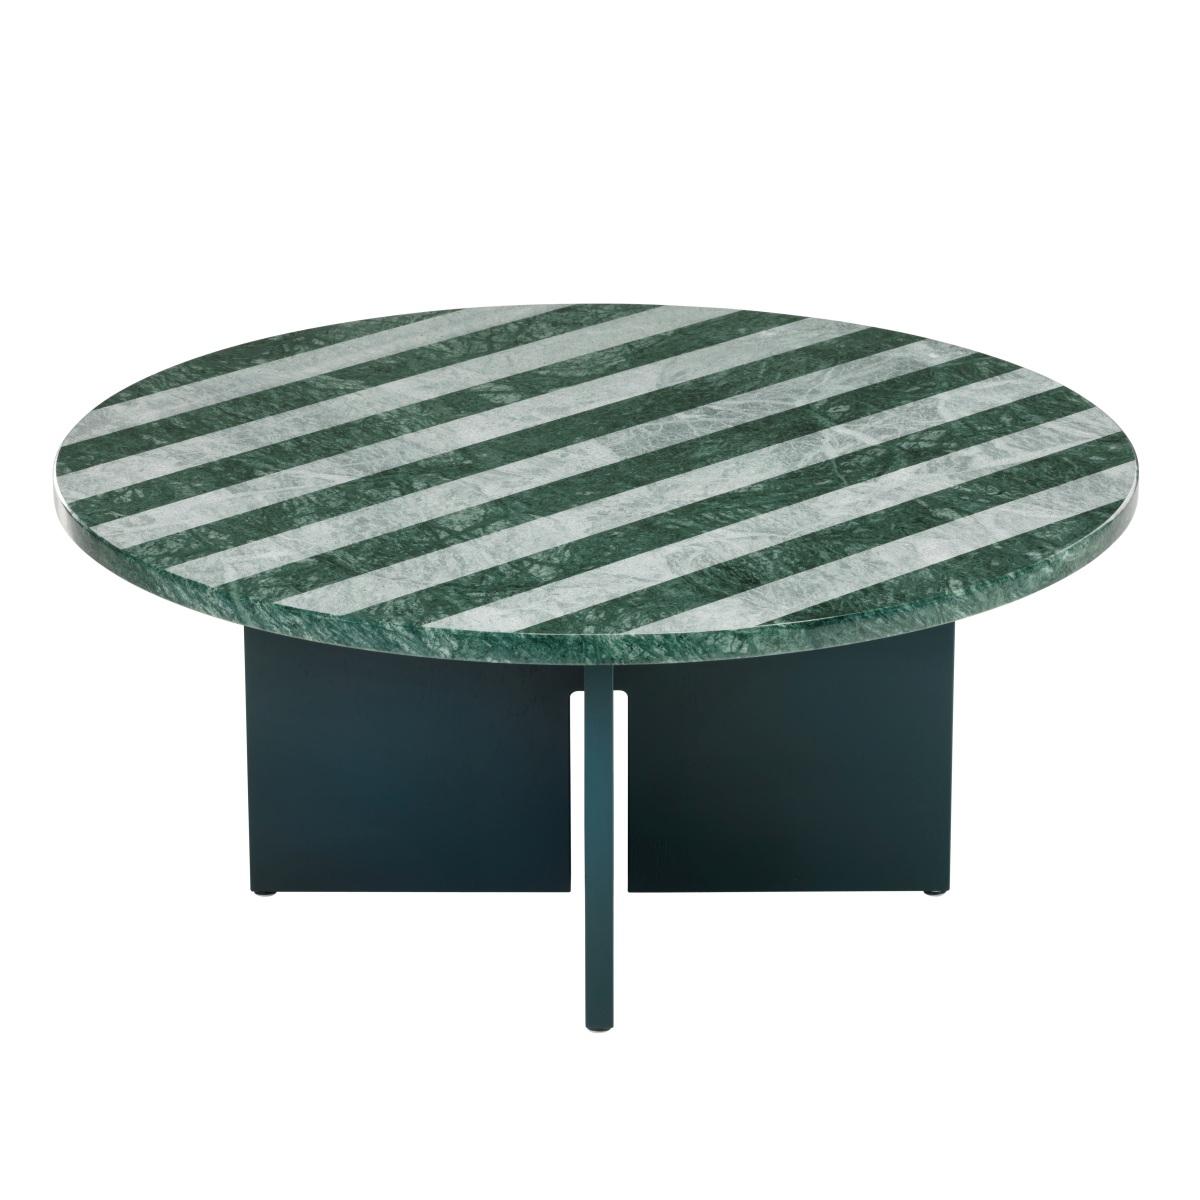 - SEDIMENT Coffee Table - Favius